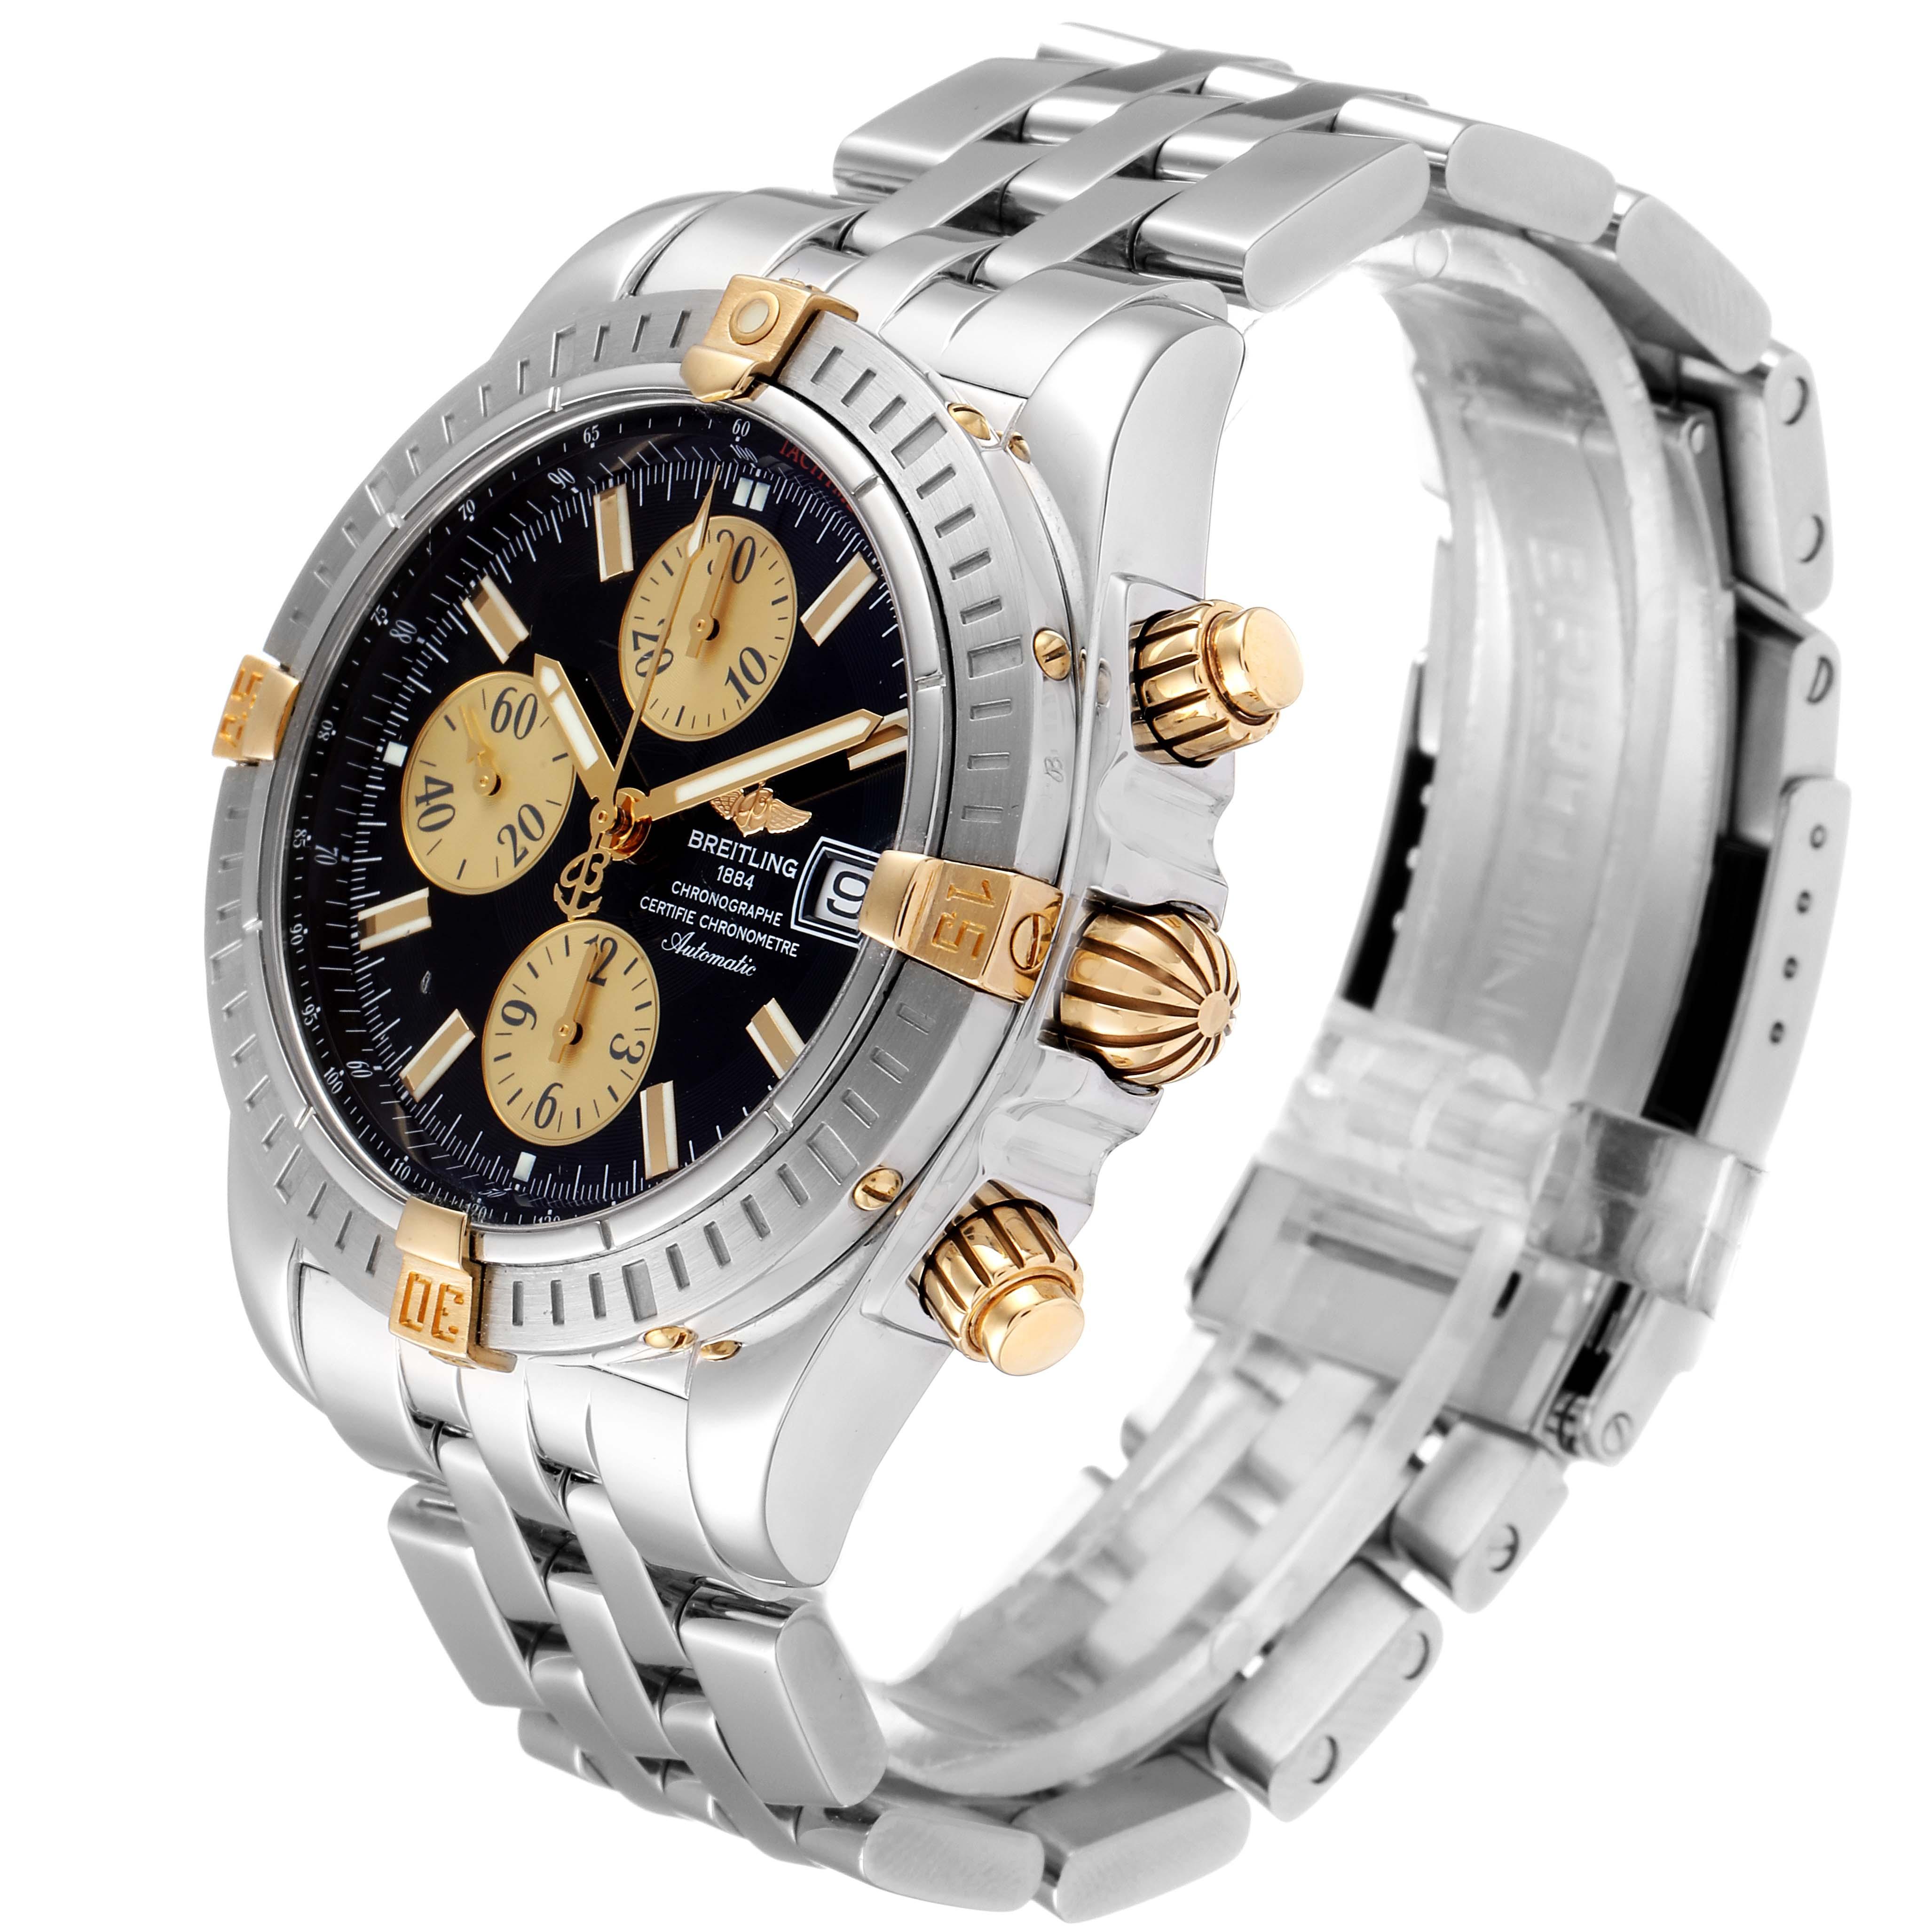 Breitling Chronomat Steel 18K Yellow Gold Black Dial Mens Watch B13356 SwissWatchExpo